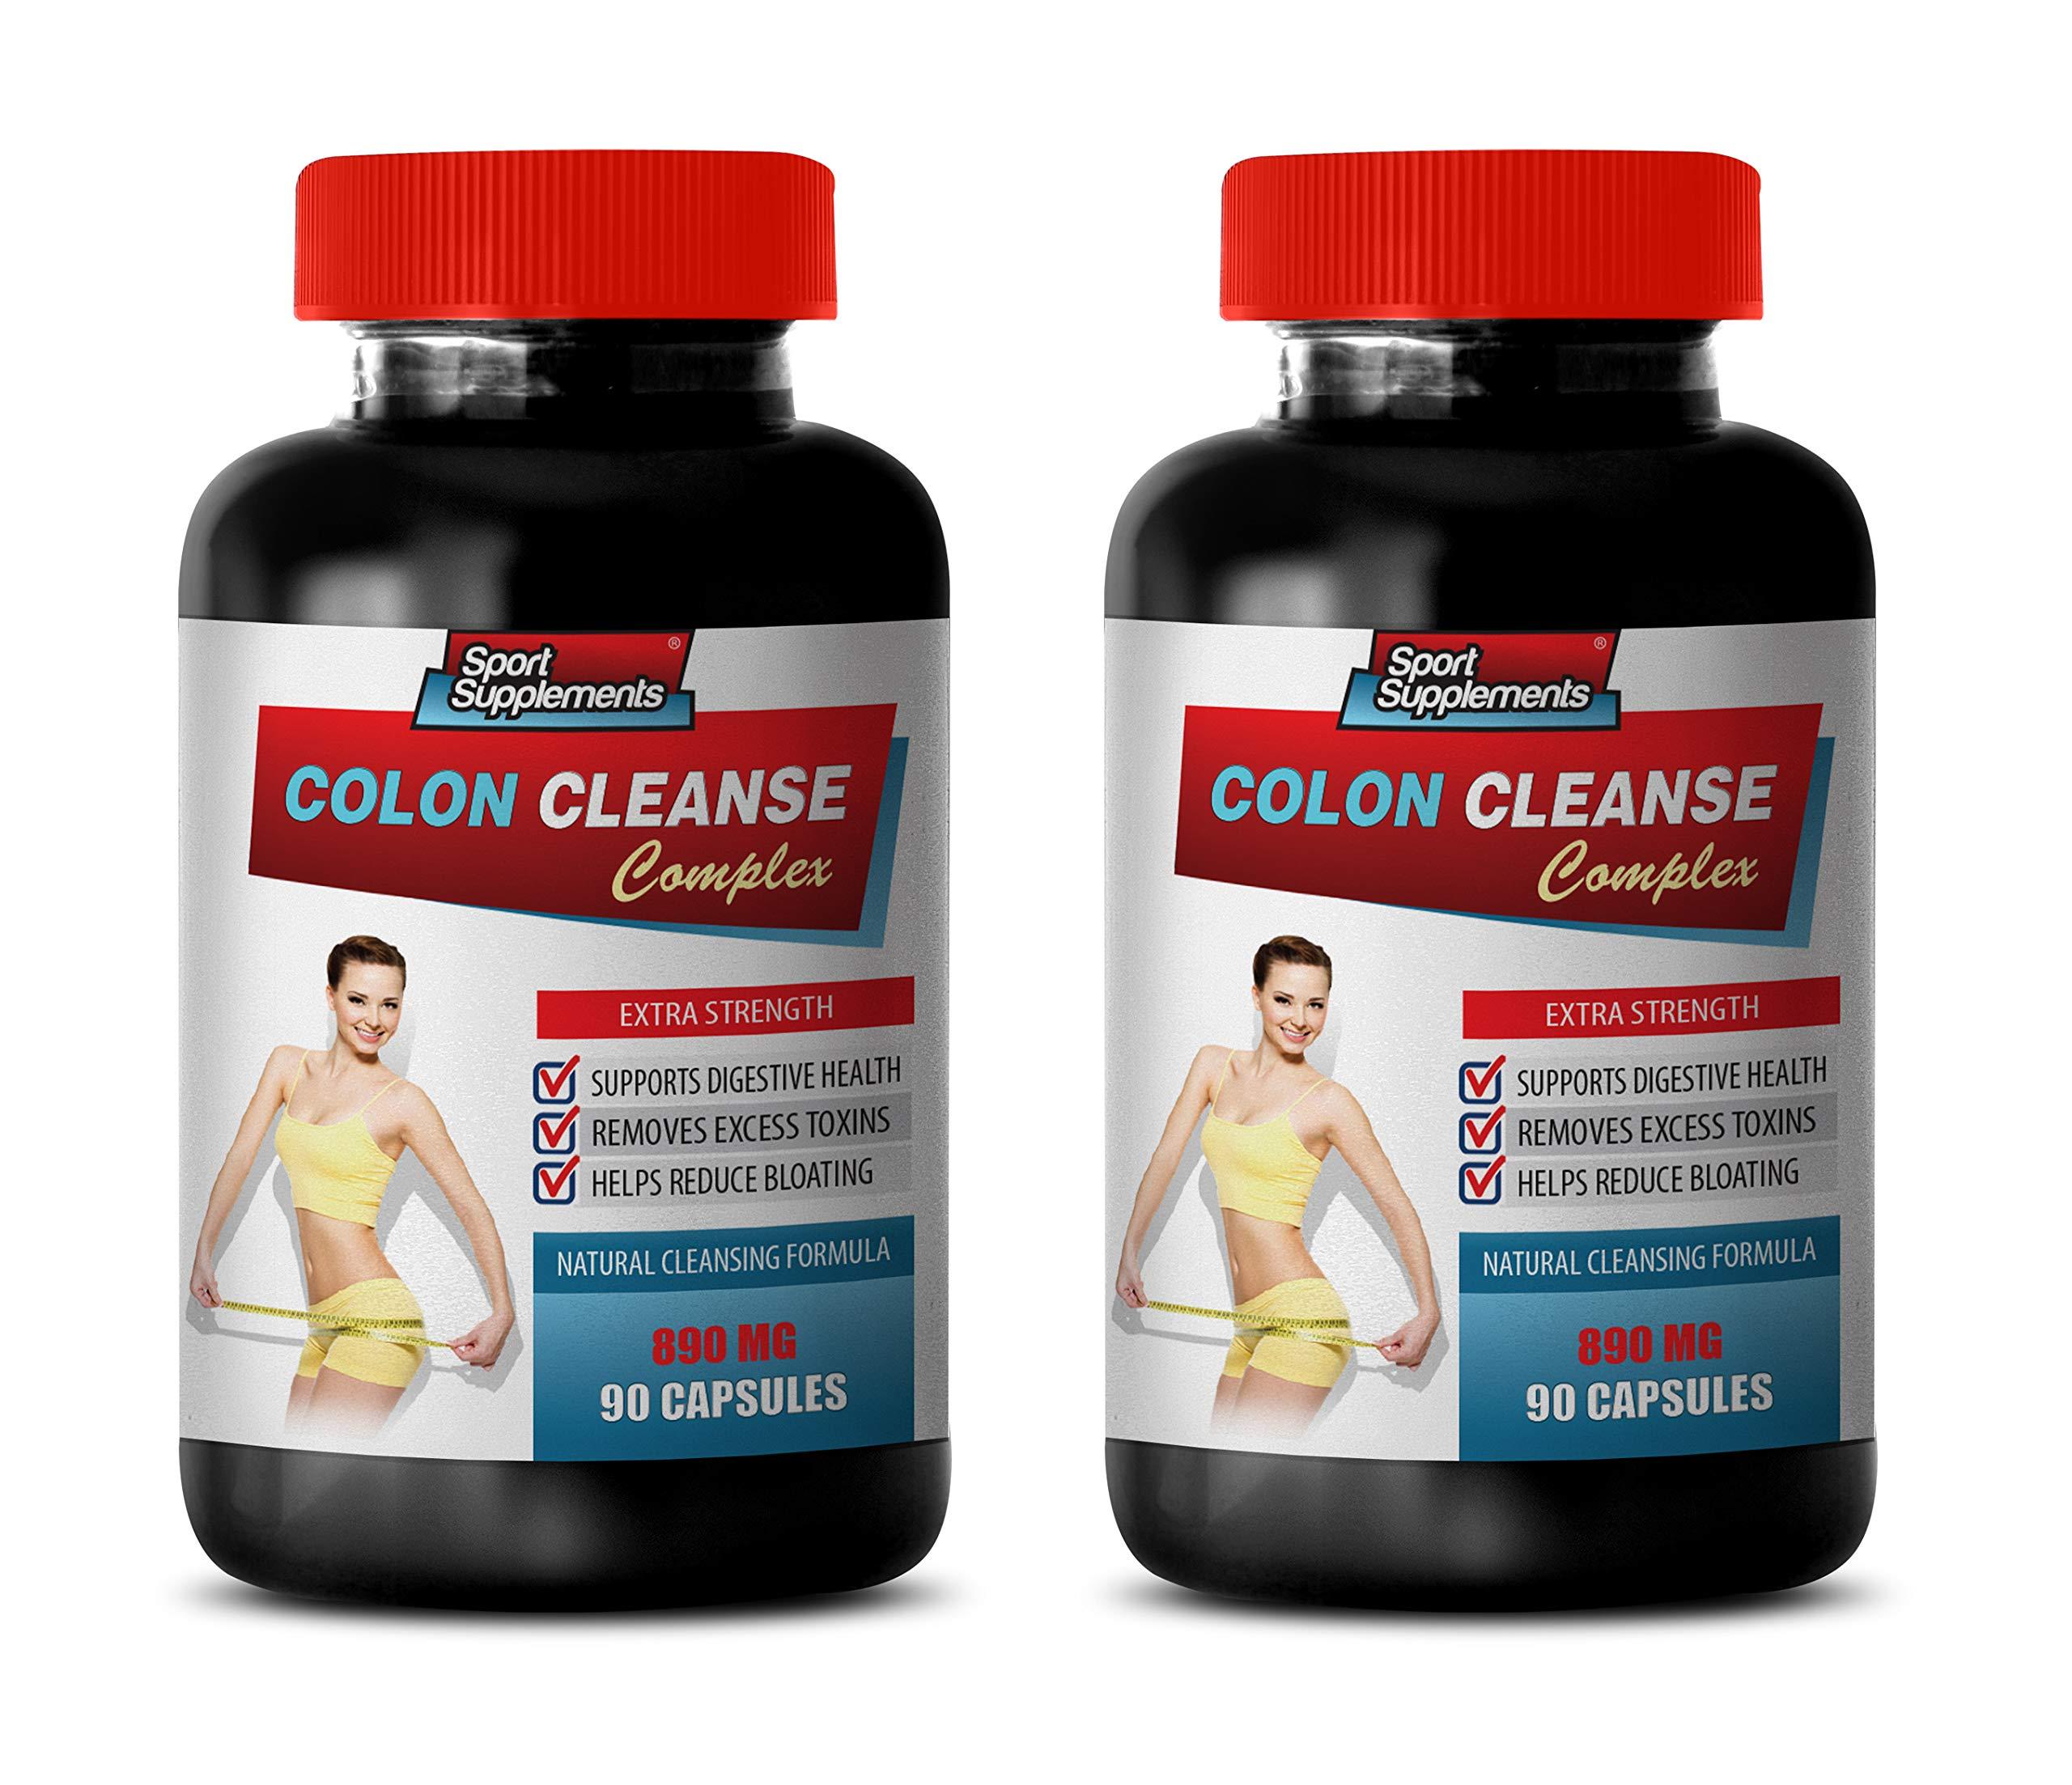 Colon Detox Supplements - Colon Cleanse Complex - Extra Strength - psyllium Husk Supplement - 2 Bottles 180 Capsules